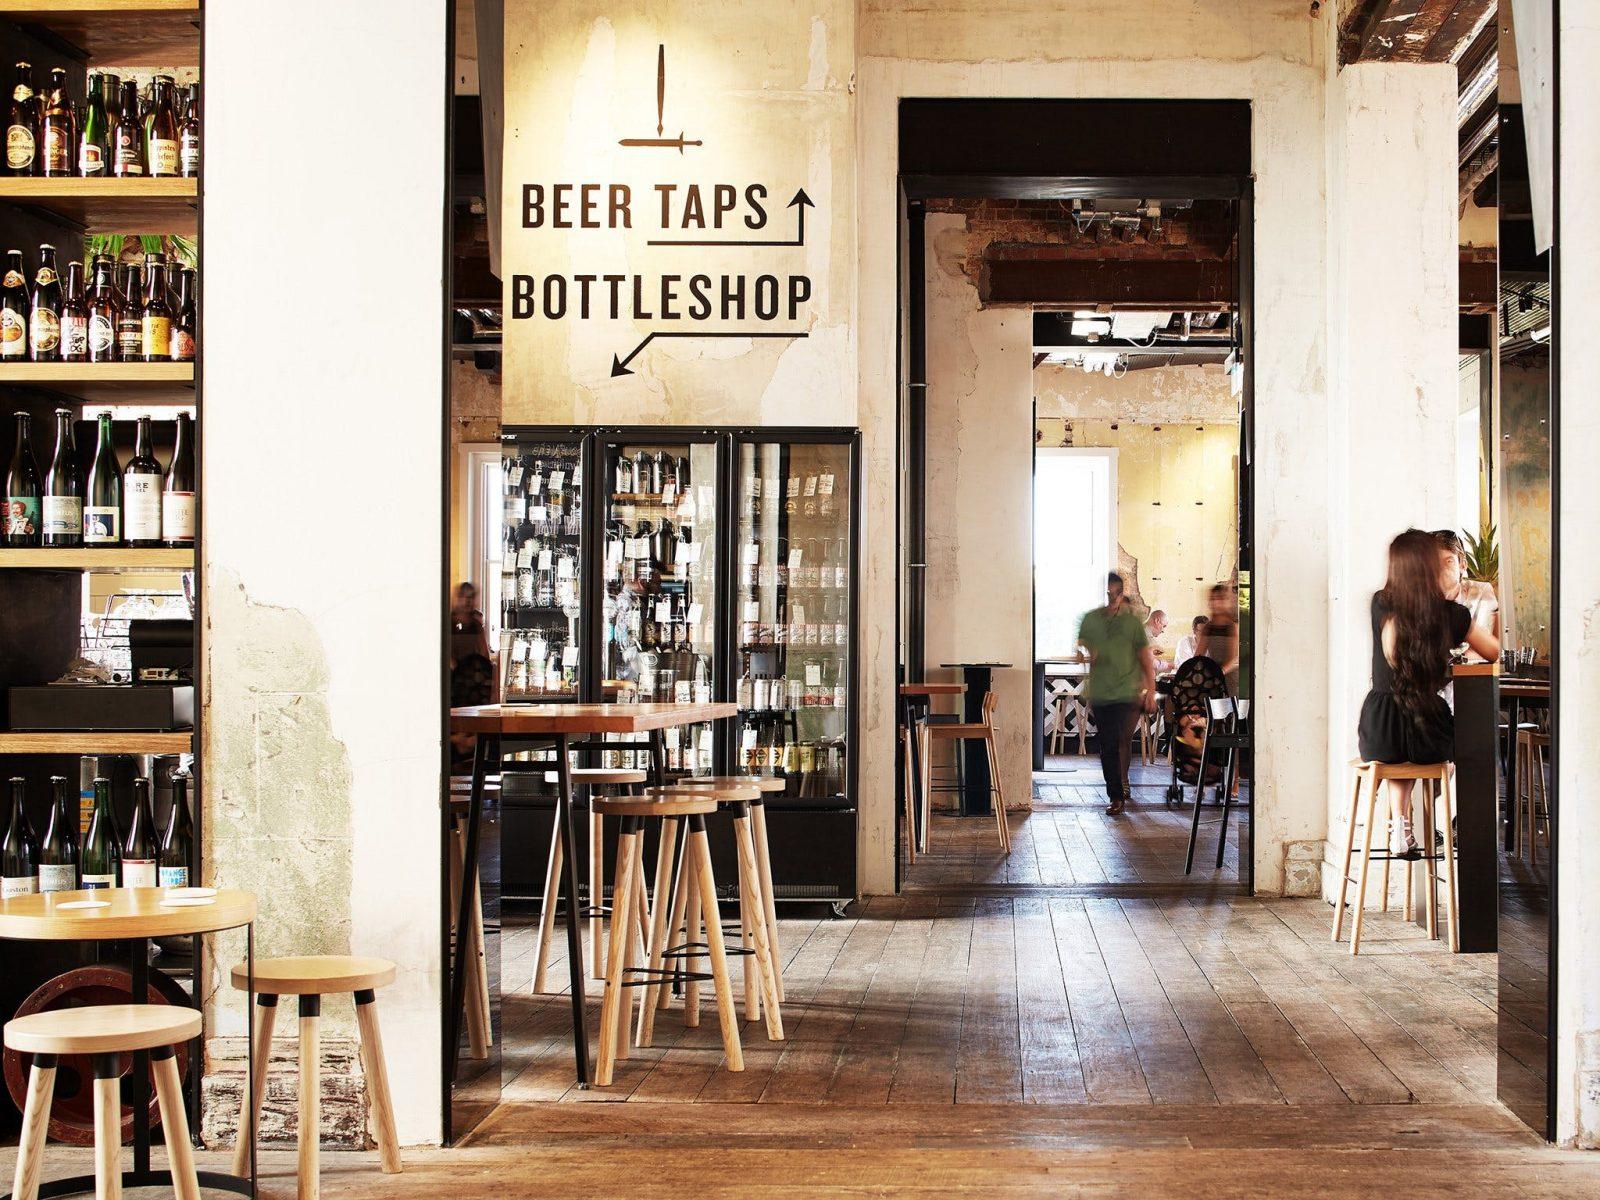 Petition Beer Corner, Perth, Western Australia